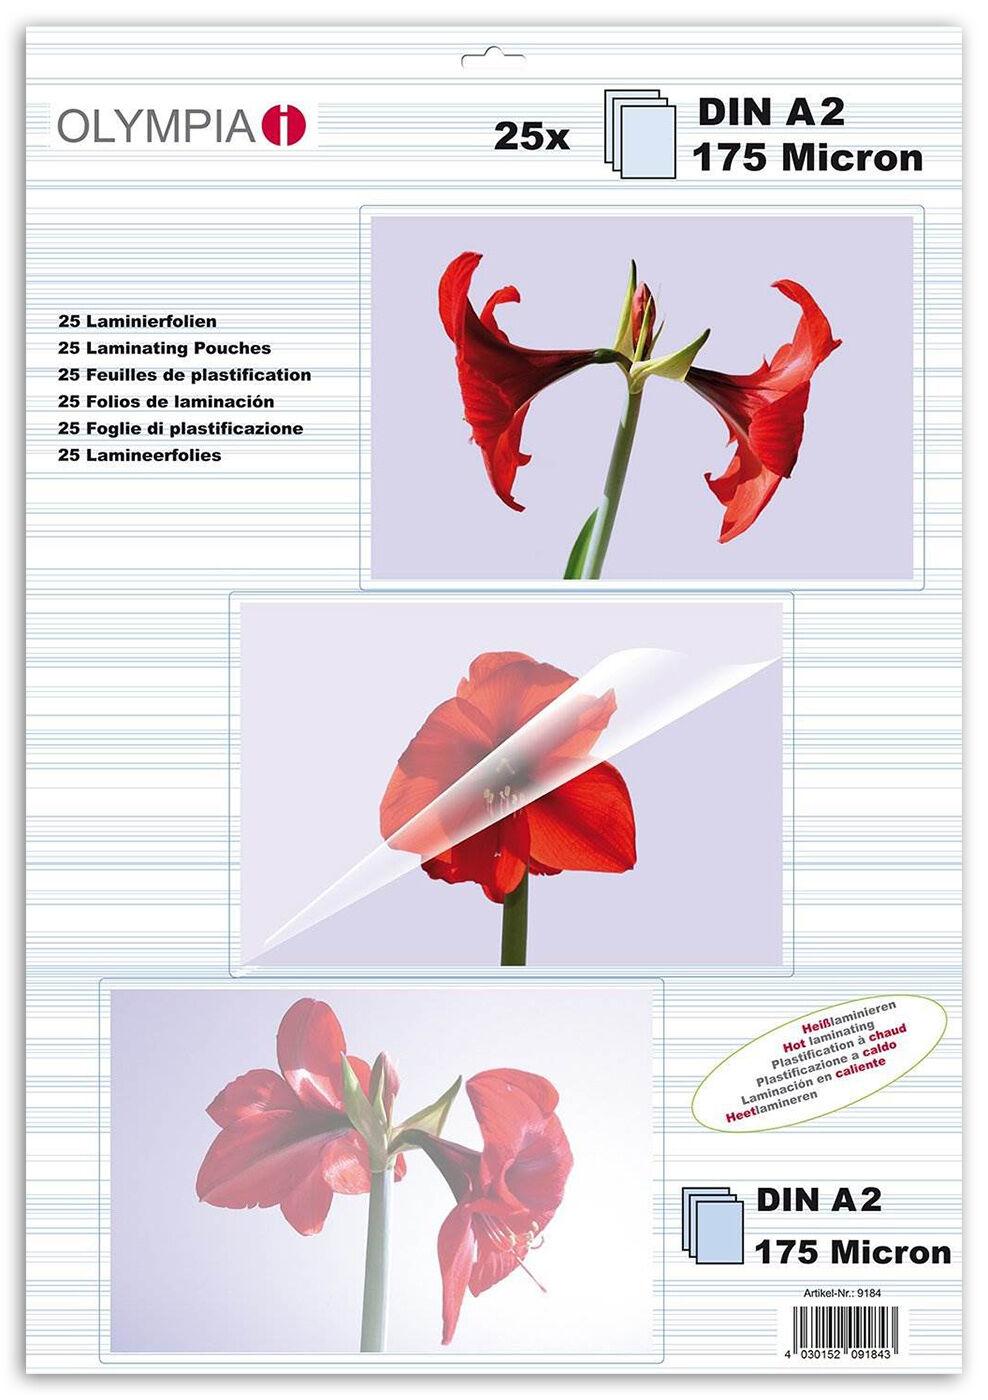 Difox Olympia Laminaatti DIN A2 175 Micron - 25 kpl